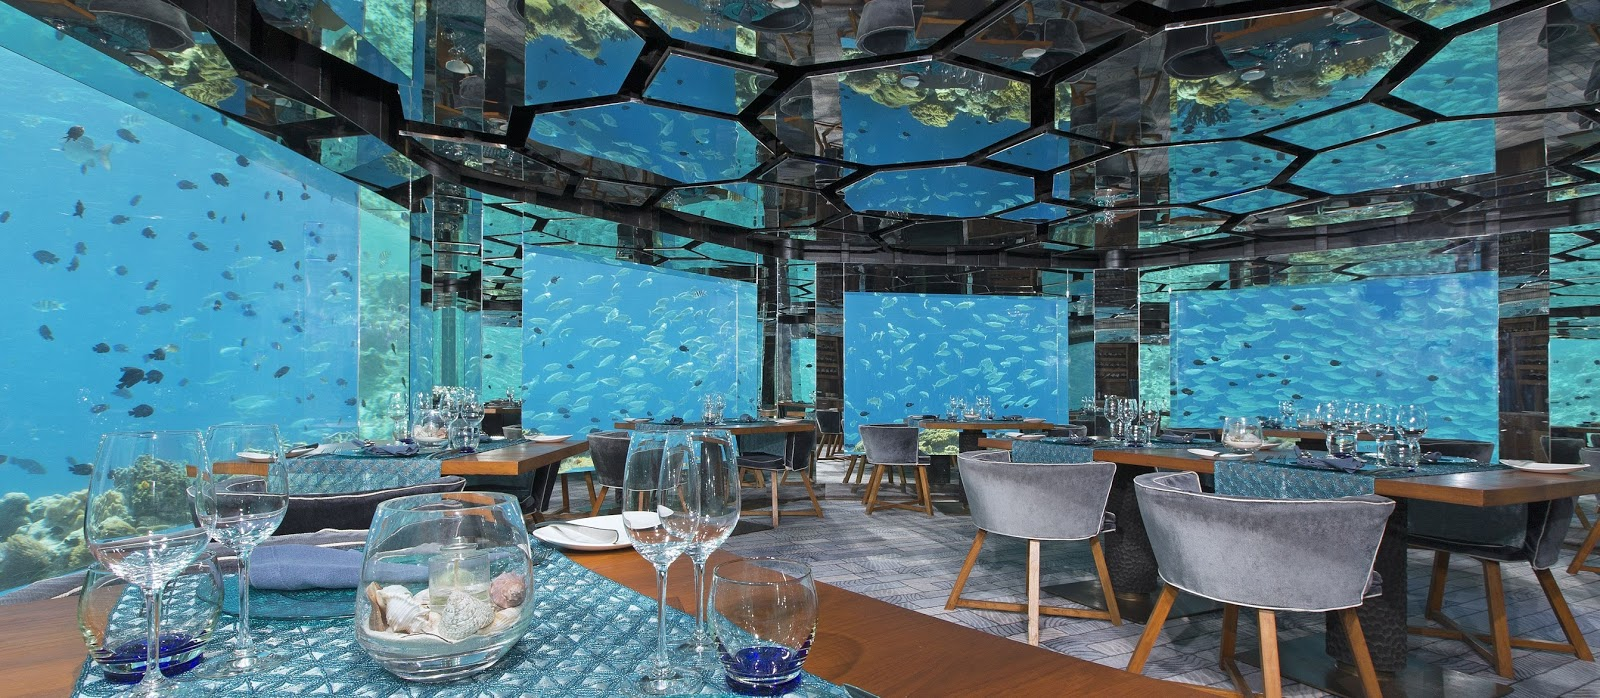 Underwater restaurants in maldives lalumi travels for Maldivas hotel bajo el agua